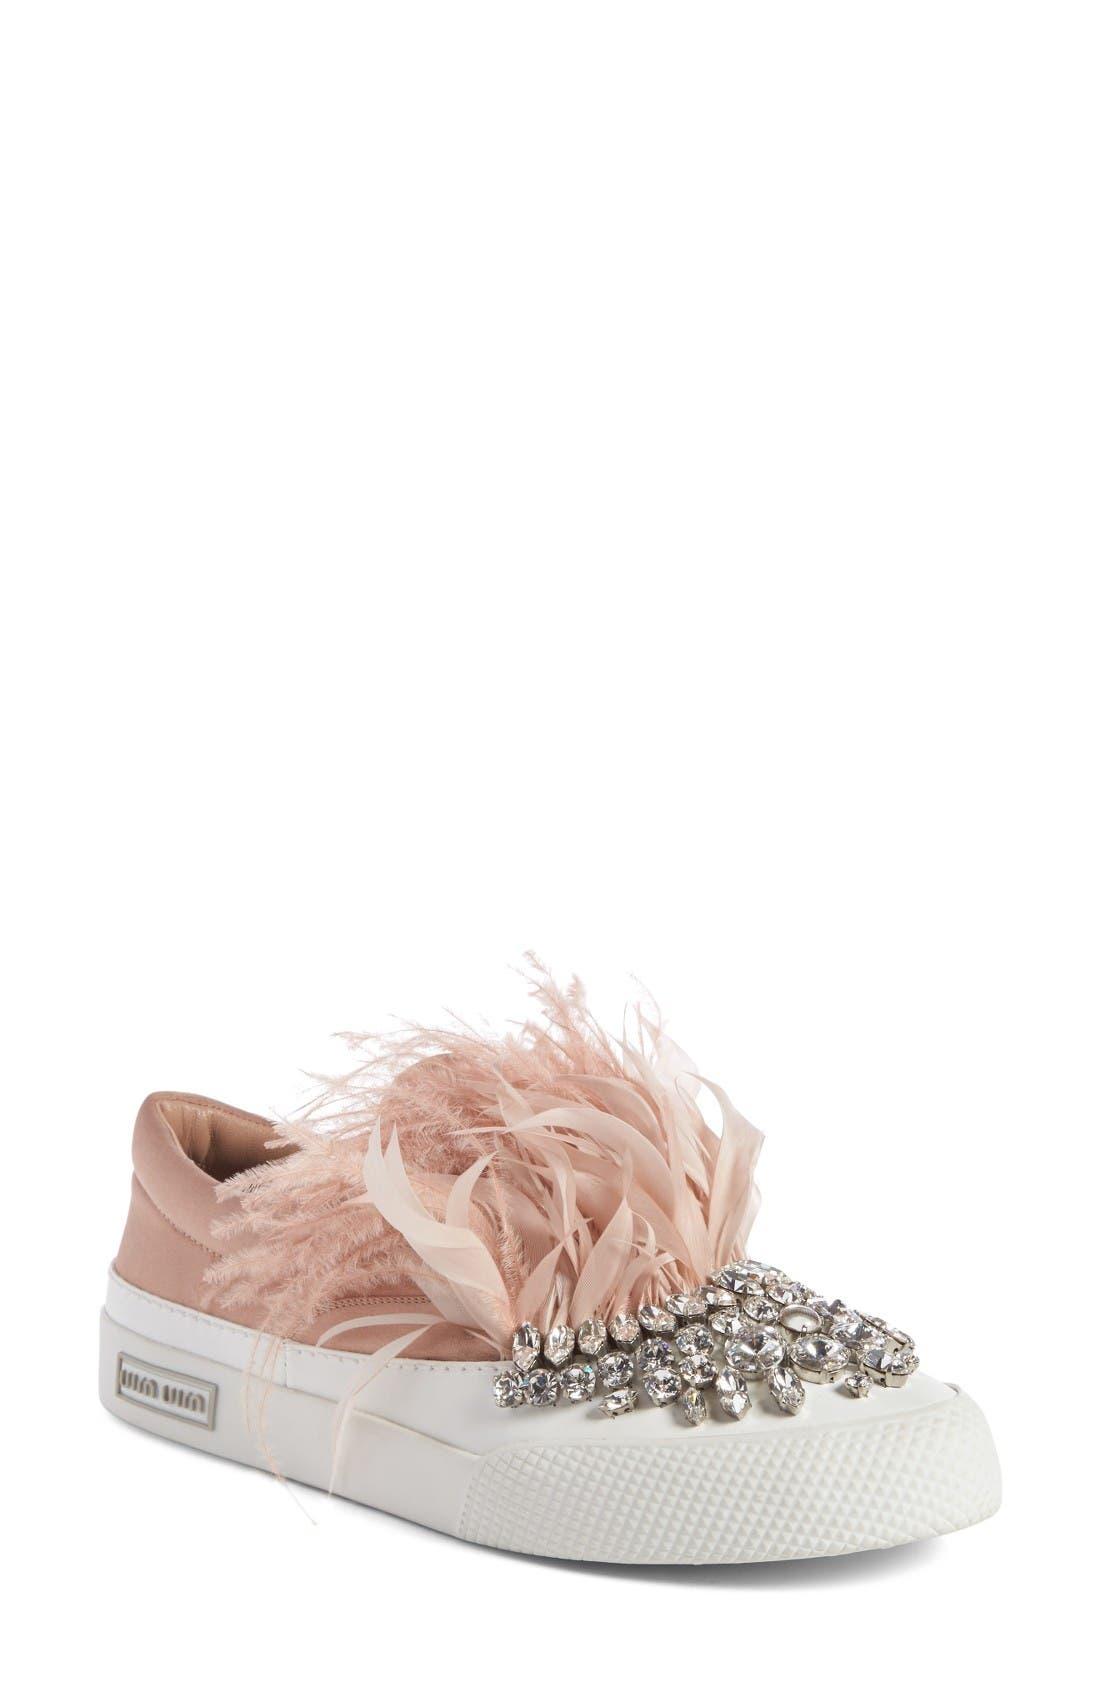 Main Image - Miu Miu Embellished Feather Slip-On Sneaker (Women)